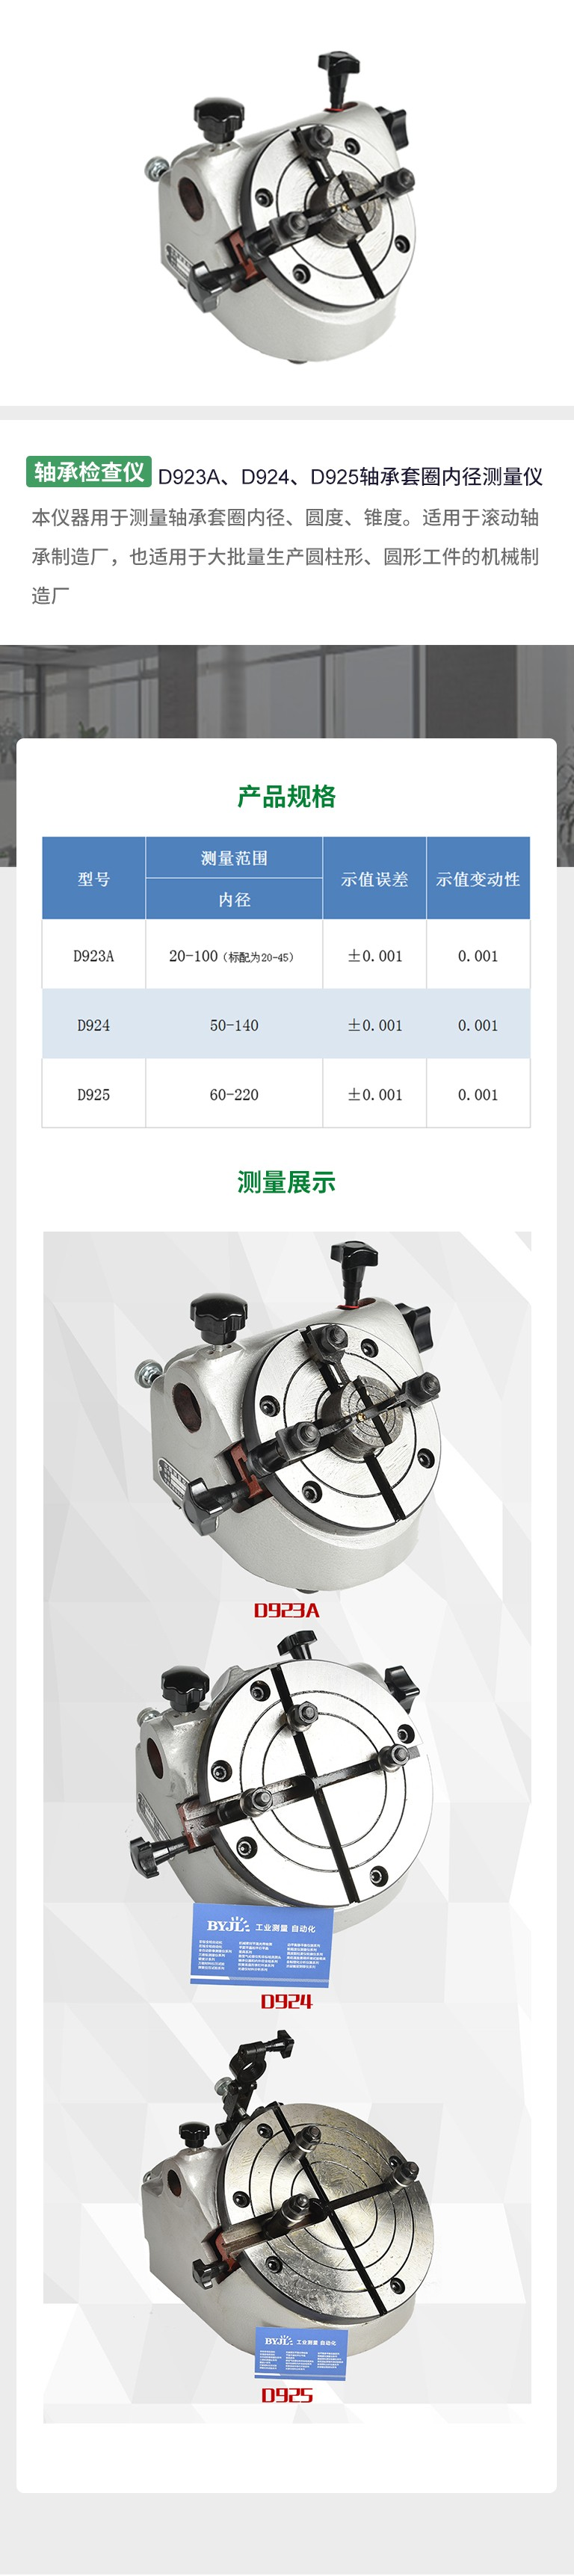 D923A、D924、D925轴承套圈内径测量仪_01.jpg